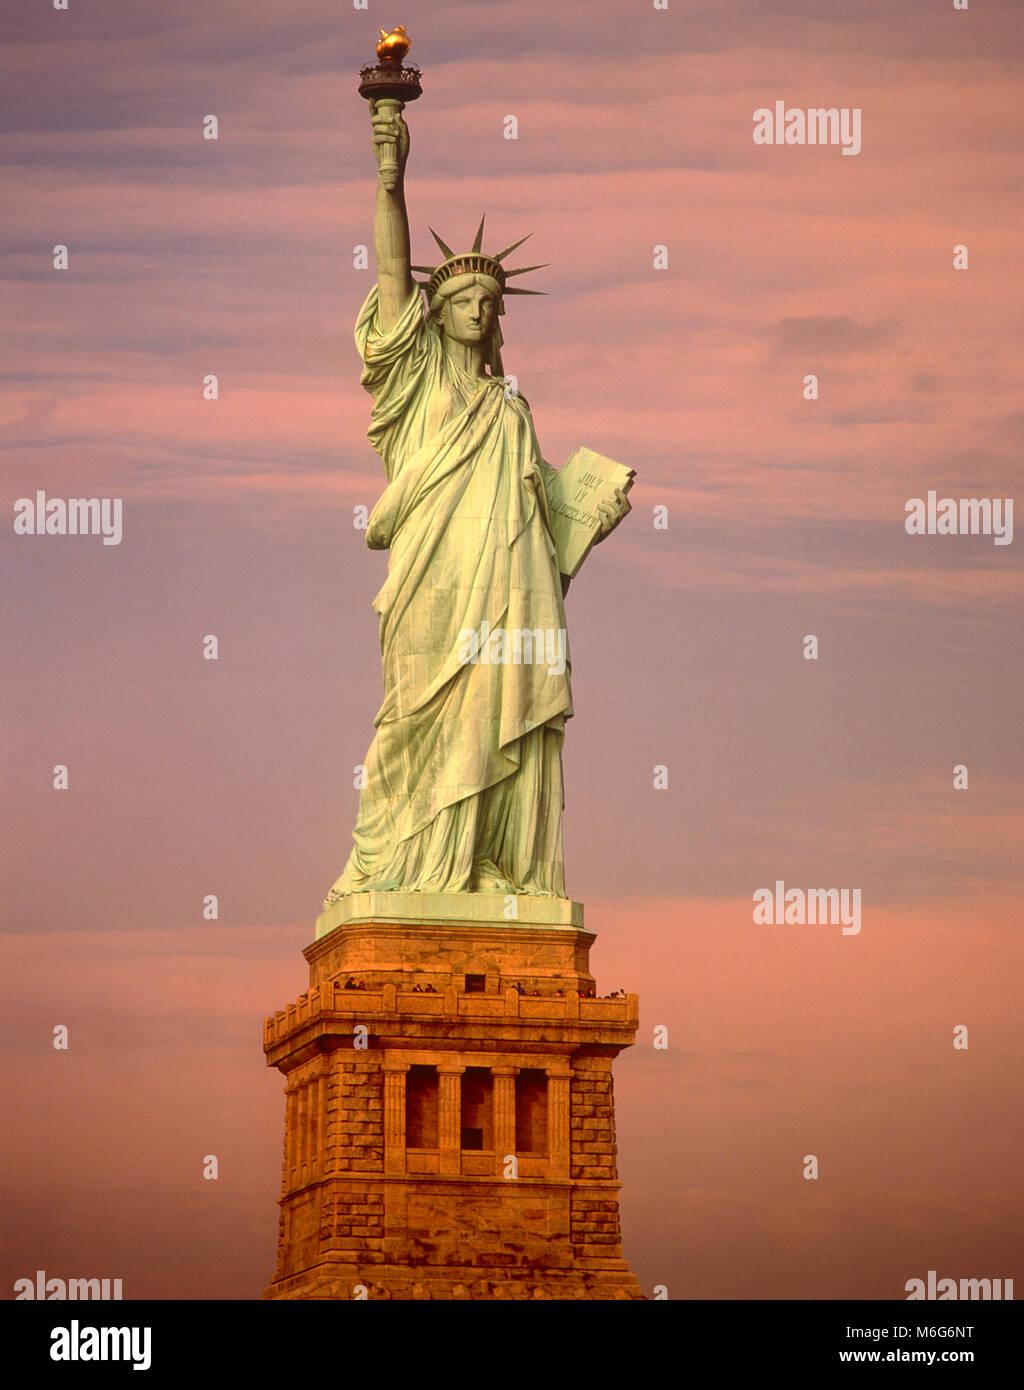 Statue of Liberty, Liberty Island, New York, USA Stock Photo